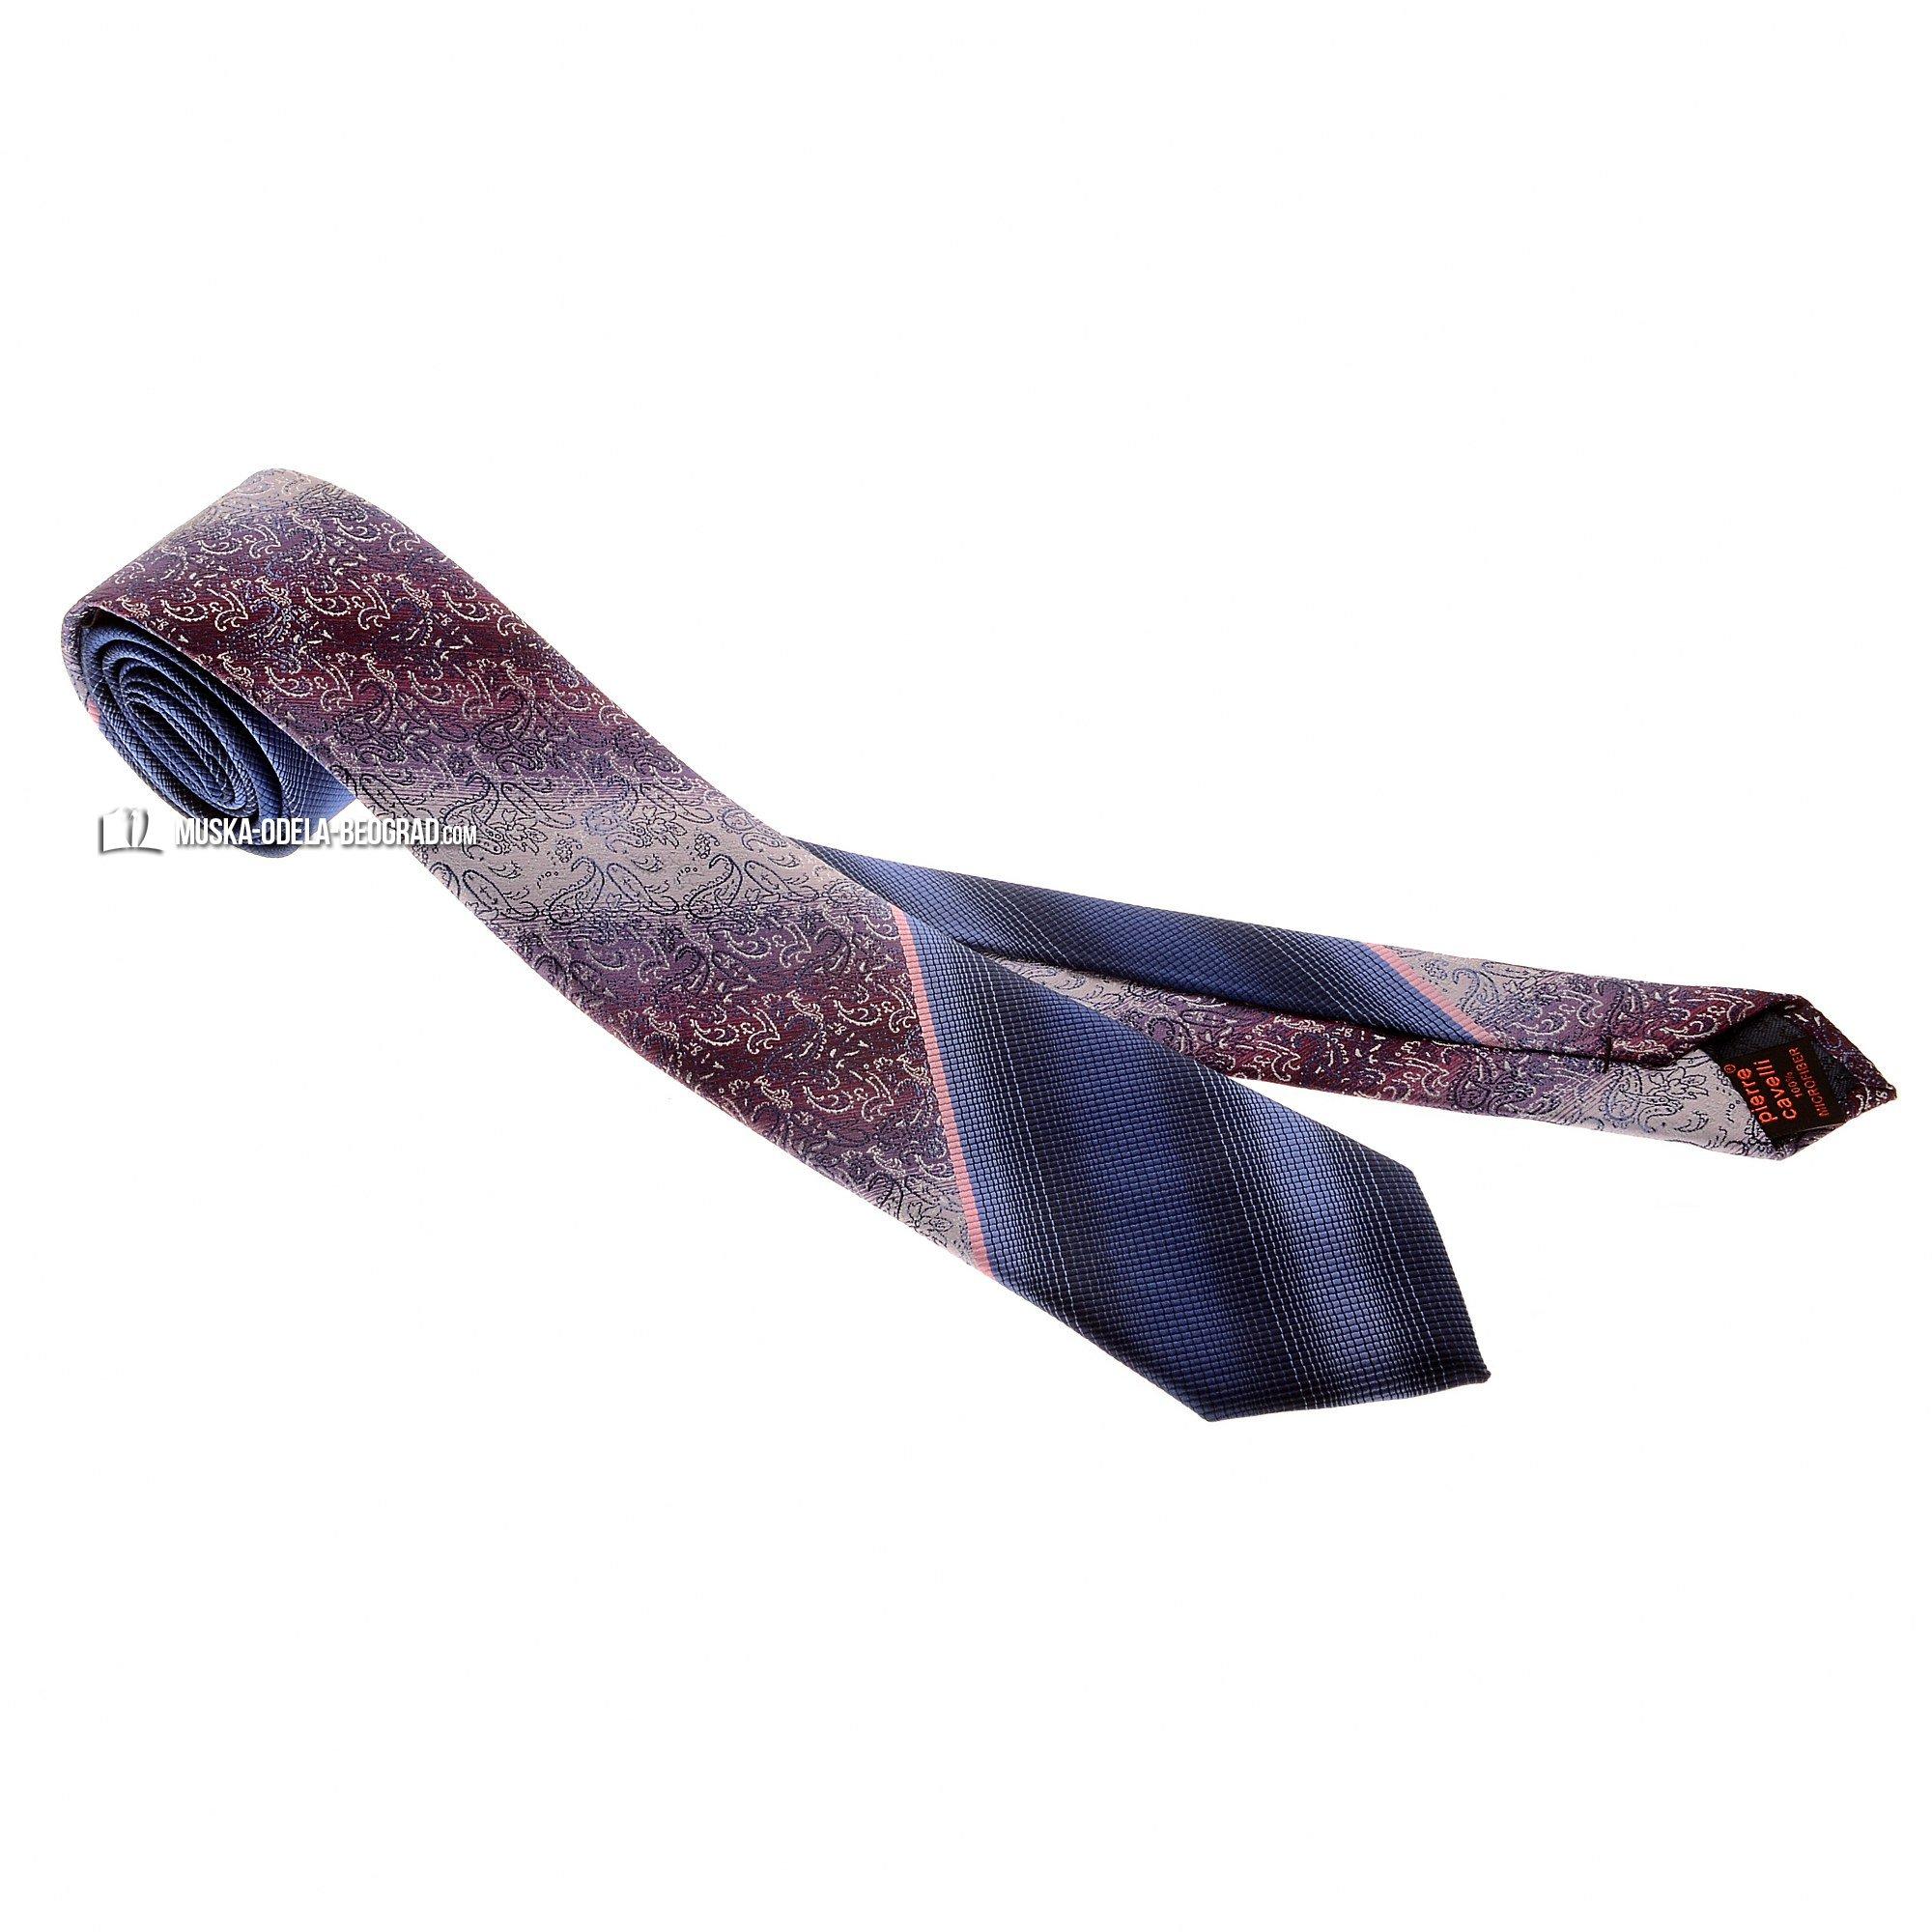 kravata #172 - kravate za odela cene, crvena kravata za mladozenje, beograd